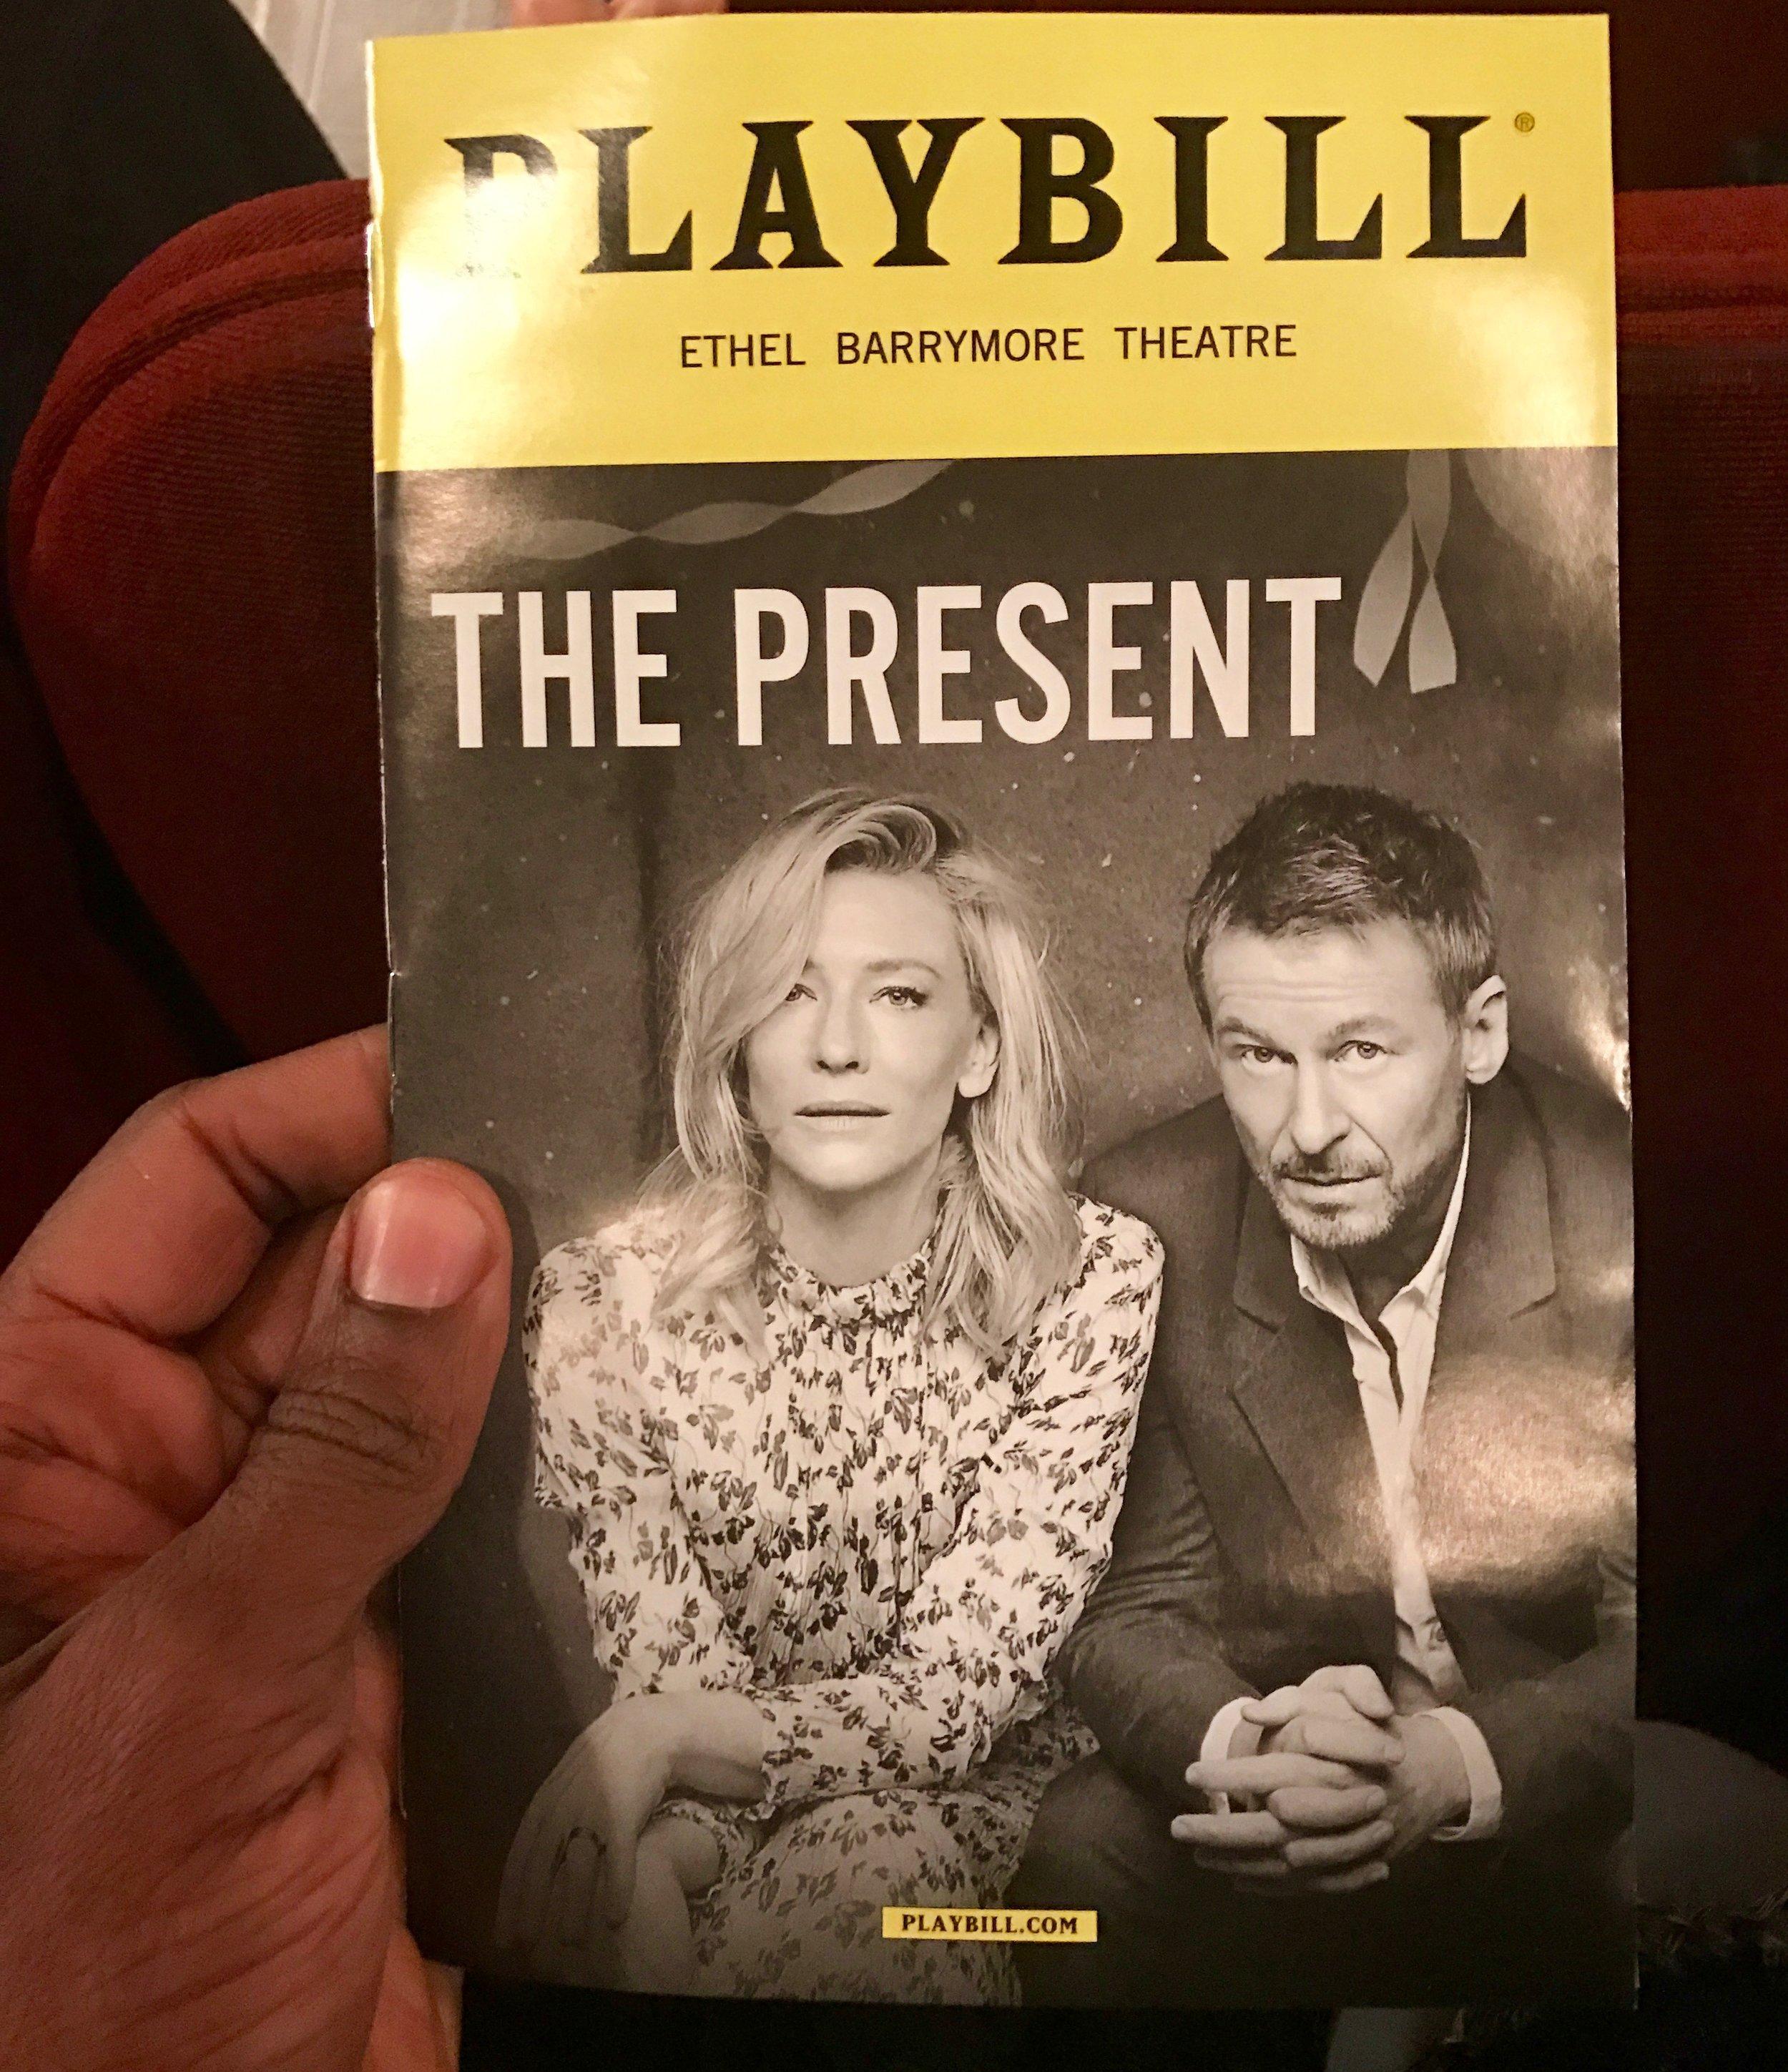 The Present Playbill